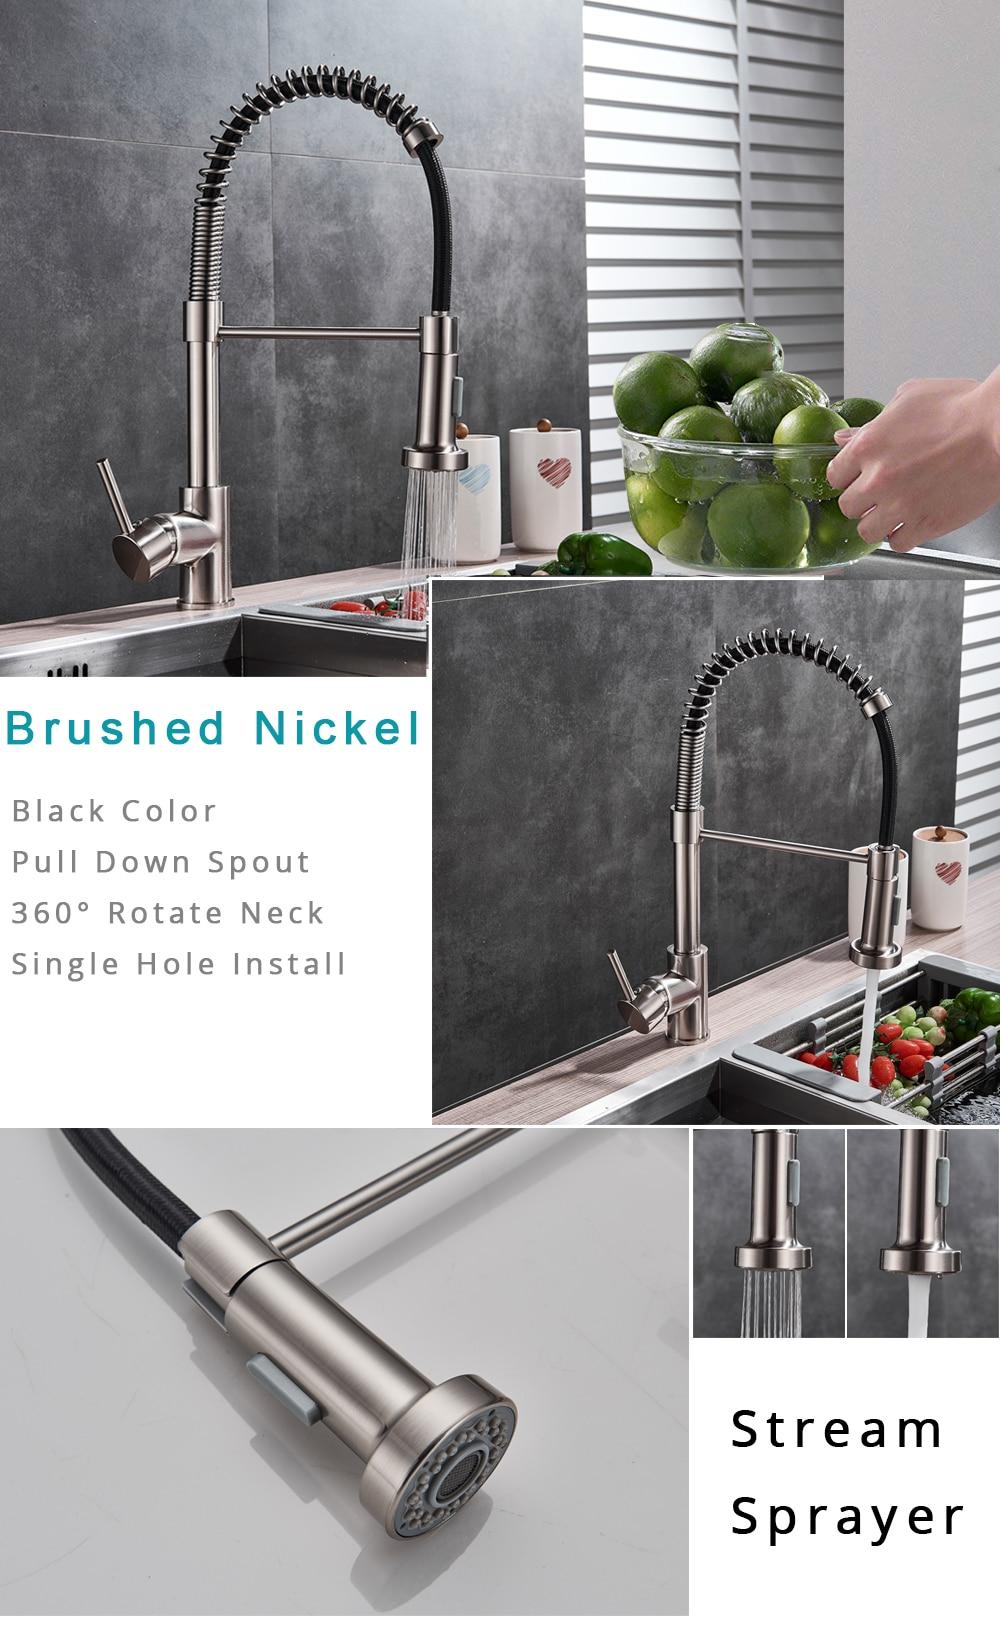 HTB1toBZXkL0gK0jSZFAq6AA9pXa9 Rozin Matte Black Kitchen Faucet Deck Mounted Mixer Tap 360 Degree Rotation Stream Sprayer Nozzle Kitchen Sink Hot Cold Taps